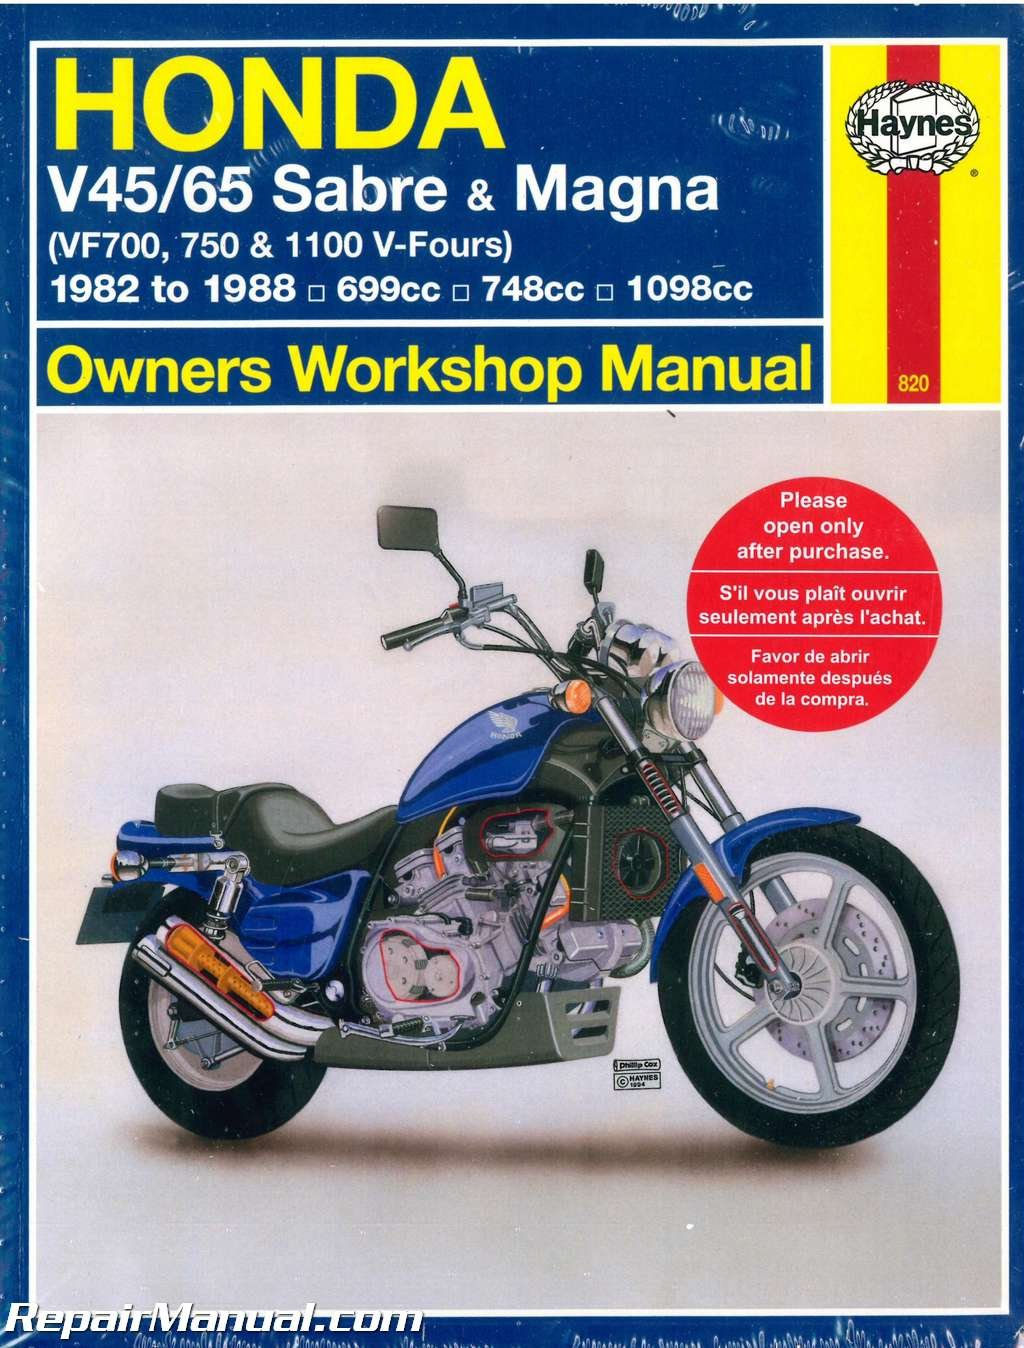 H820 Honda V45 V65 VF700 750 1100 Sabre Magna V-Fours 1982-1988 Haynes  Motorcycle Repair Manual: Manufacturer: Amazon.com: Books